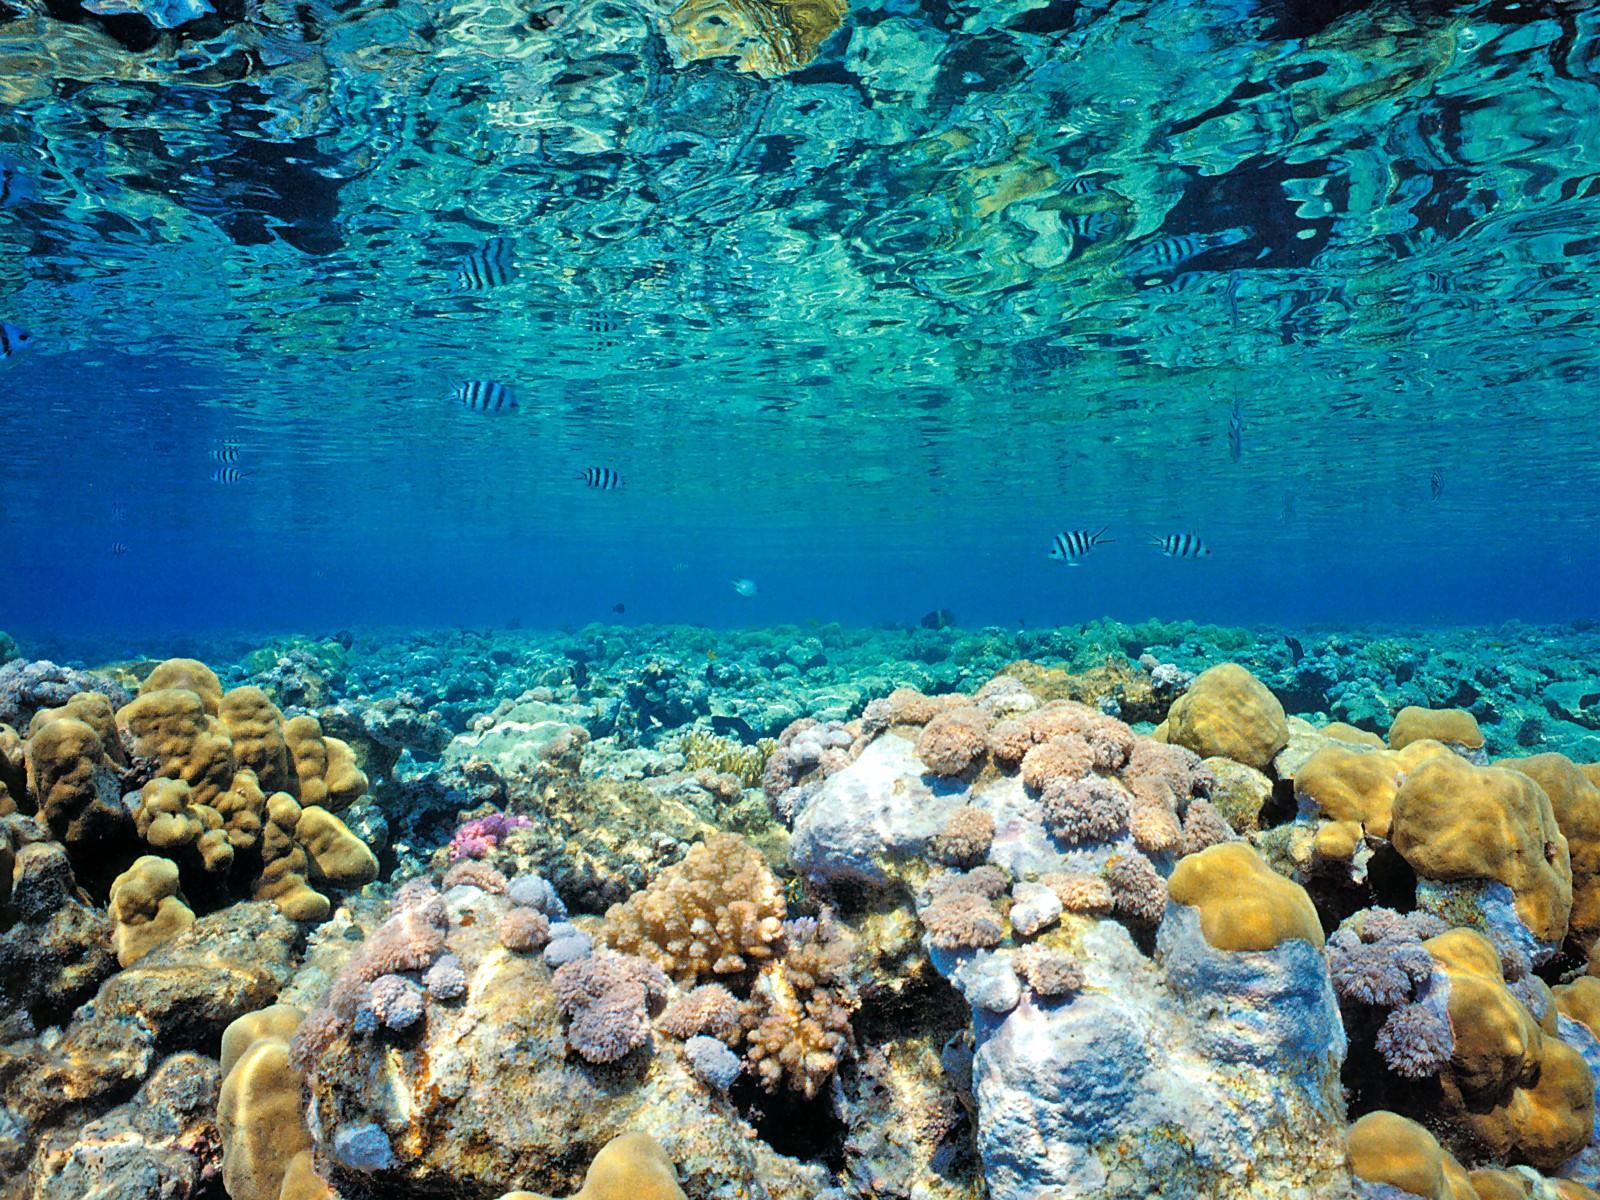 Blue Coral Sea Wallpaper HD 917 4039 Wallpaper High Resolution 1600x1200